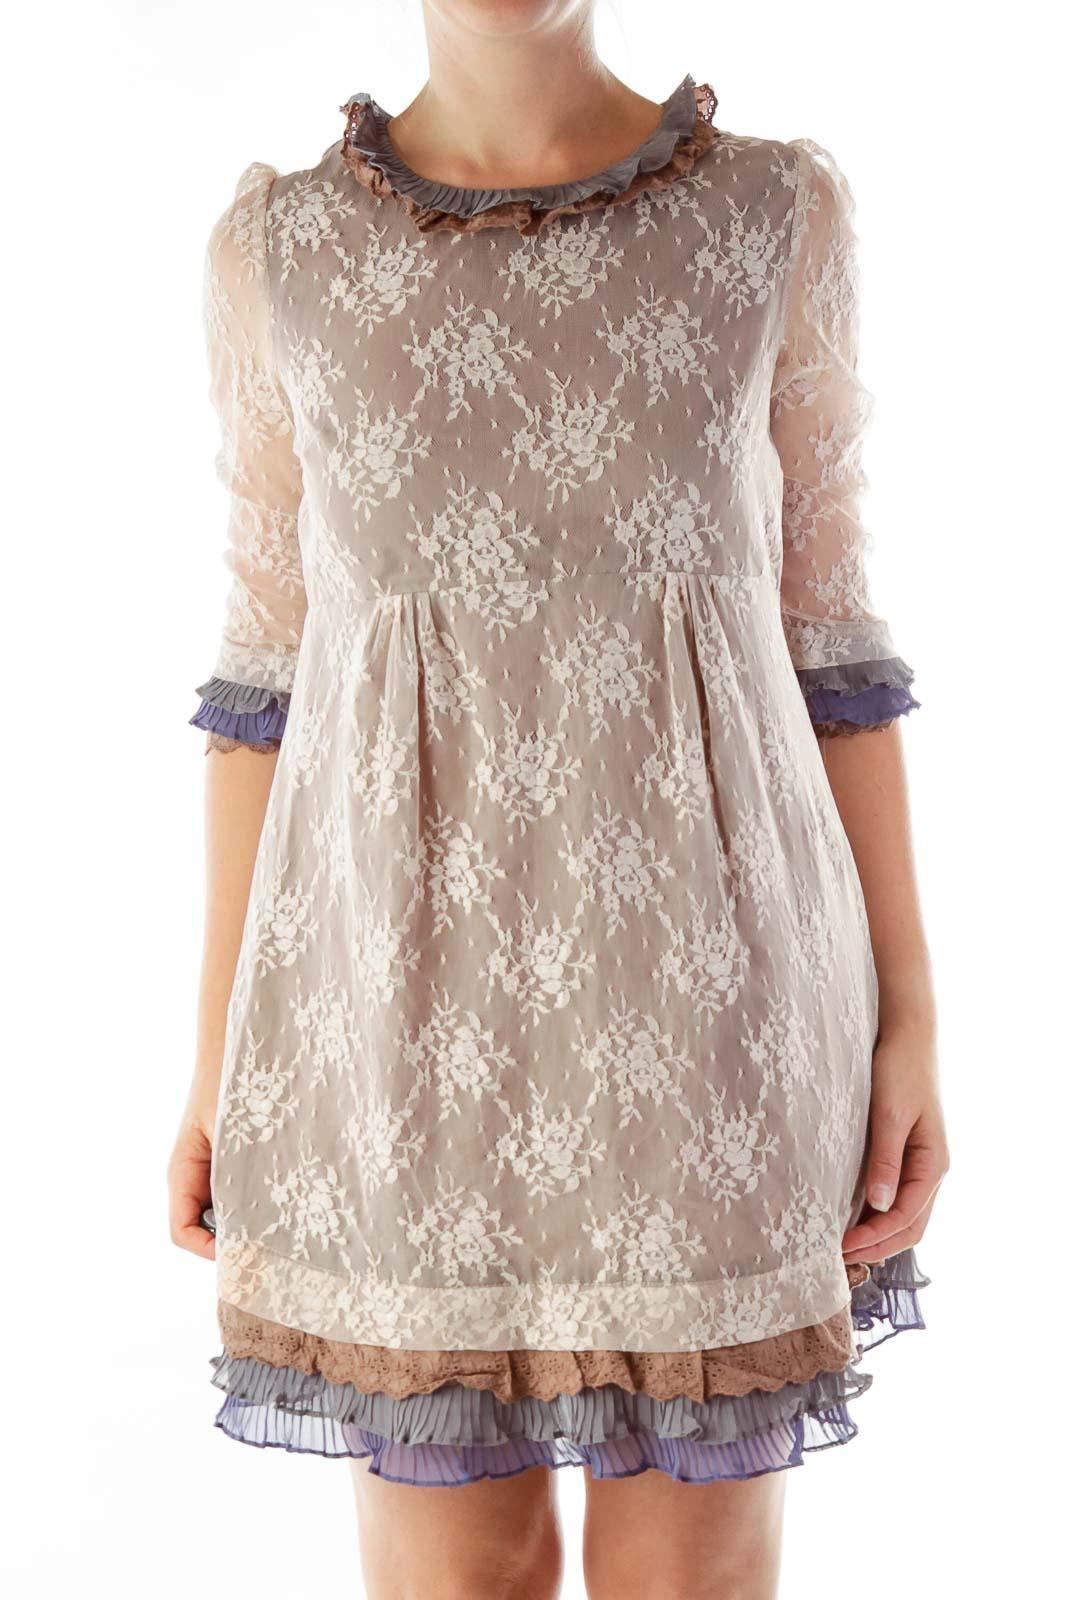 8d71eebd1b Shop Trinity clothing and handbags at SilkRoll. Trade with us!